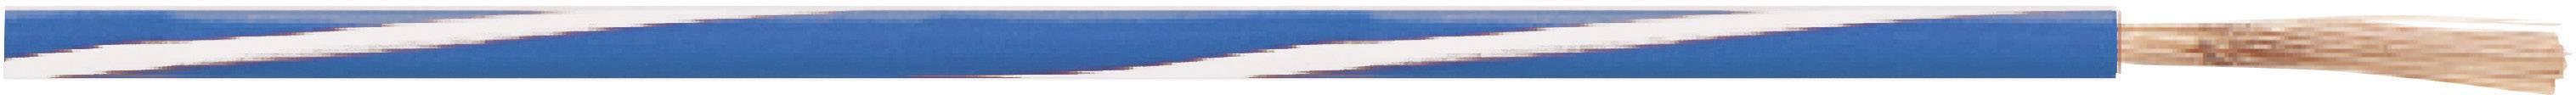 Opletenie / lanko LappKabel 4512921S X05V-K, 1 x 0.50 mm², vonkajší Ø 2.10 mm, metrový tovar, tmavomodrá, biela